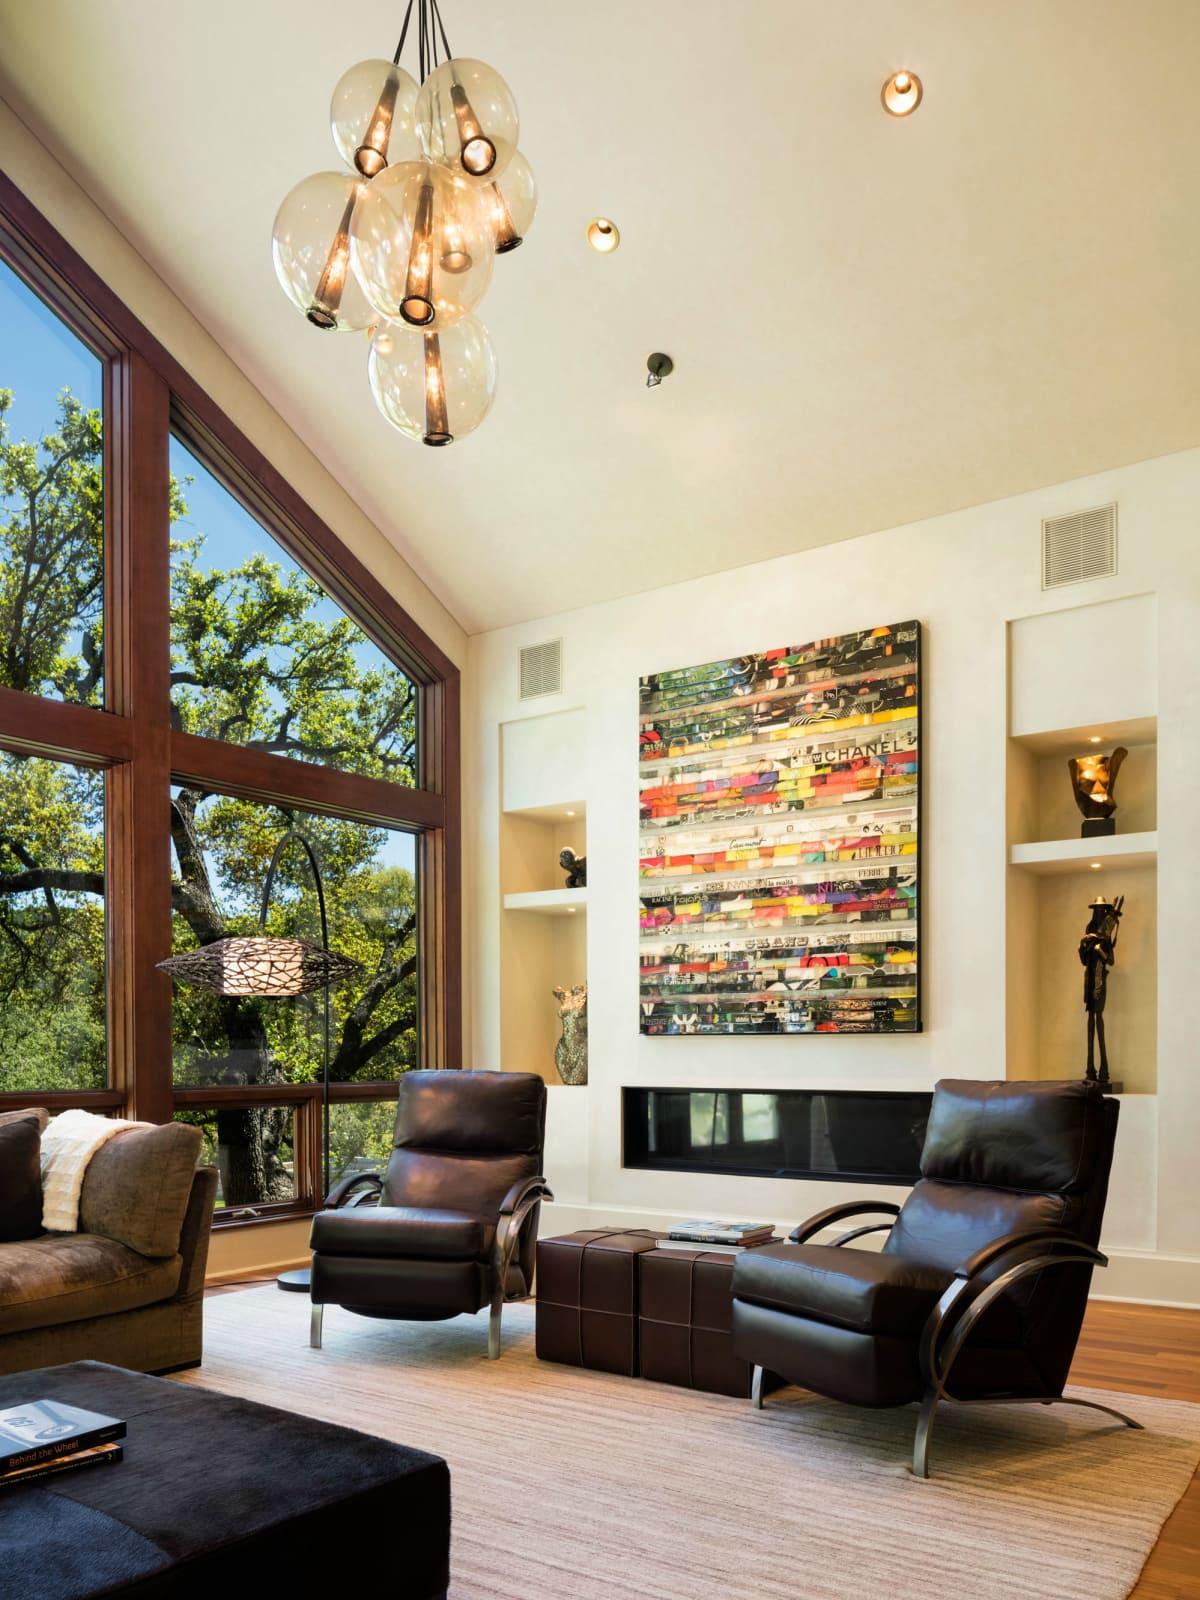 Austin house home 101 Pascal Lane Weslake Rob Roy neighborhood living room light fixture